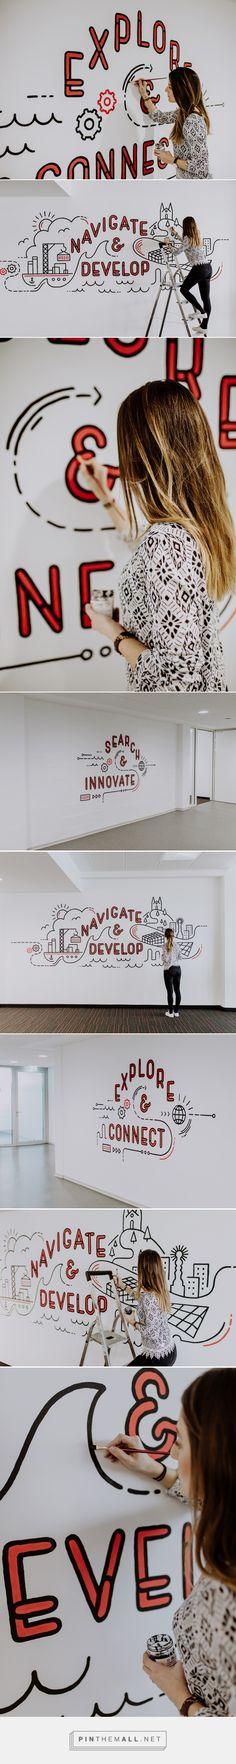 Wall Art for 'Neue Werft' coworking space in Linz #wallart #walllettering #lettering #handwriting #calligraphy #painting #art #interior #design #designer #artist